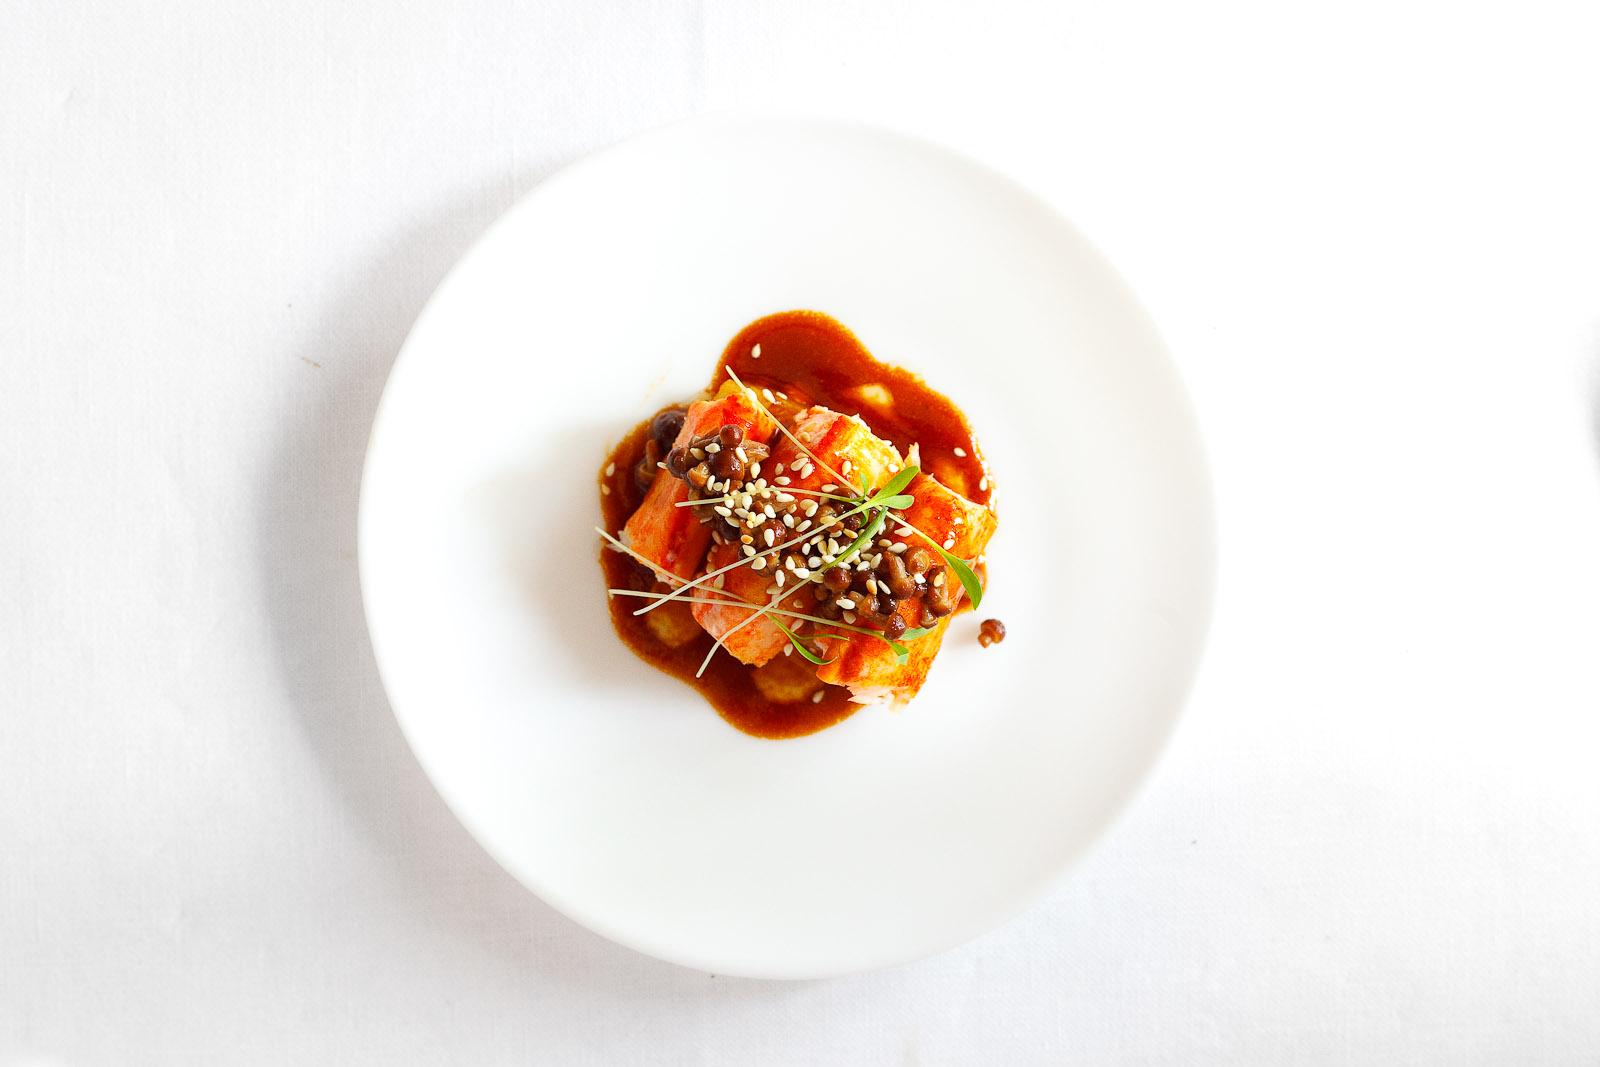 33rd Course: Shanghai lobster